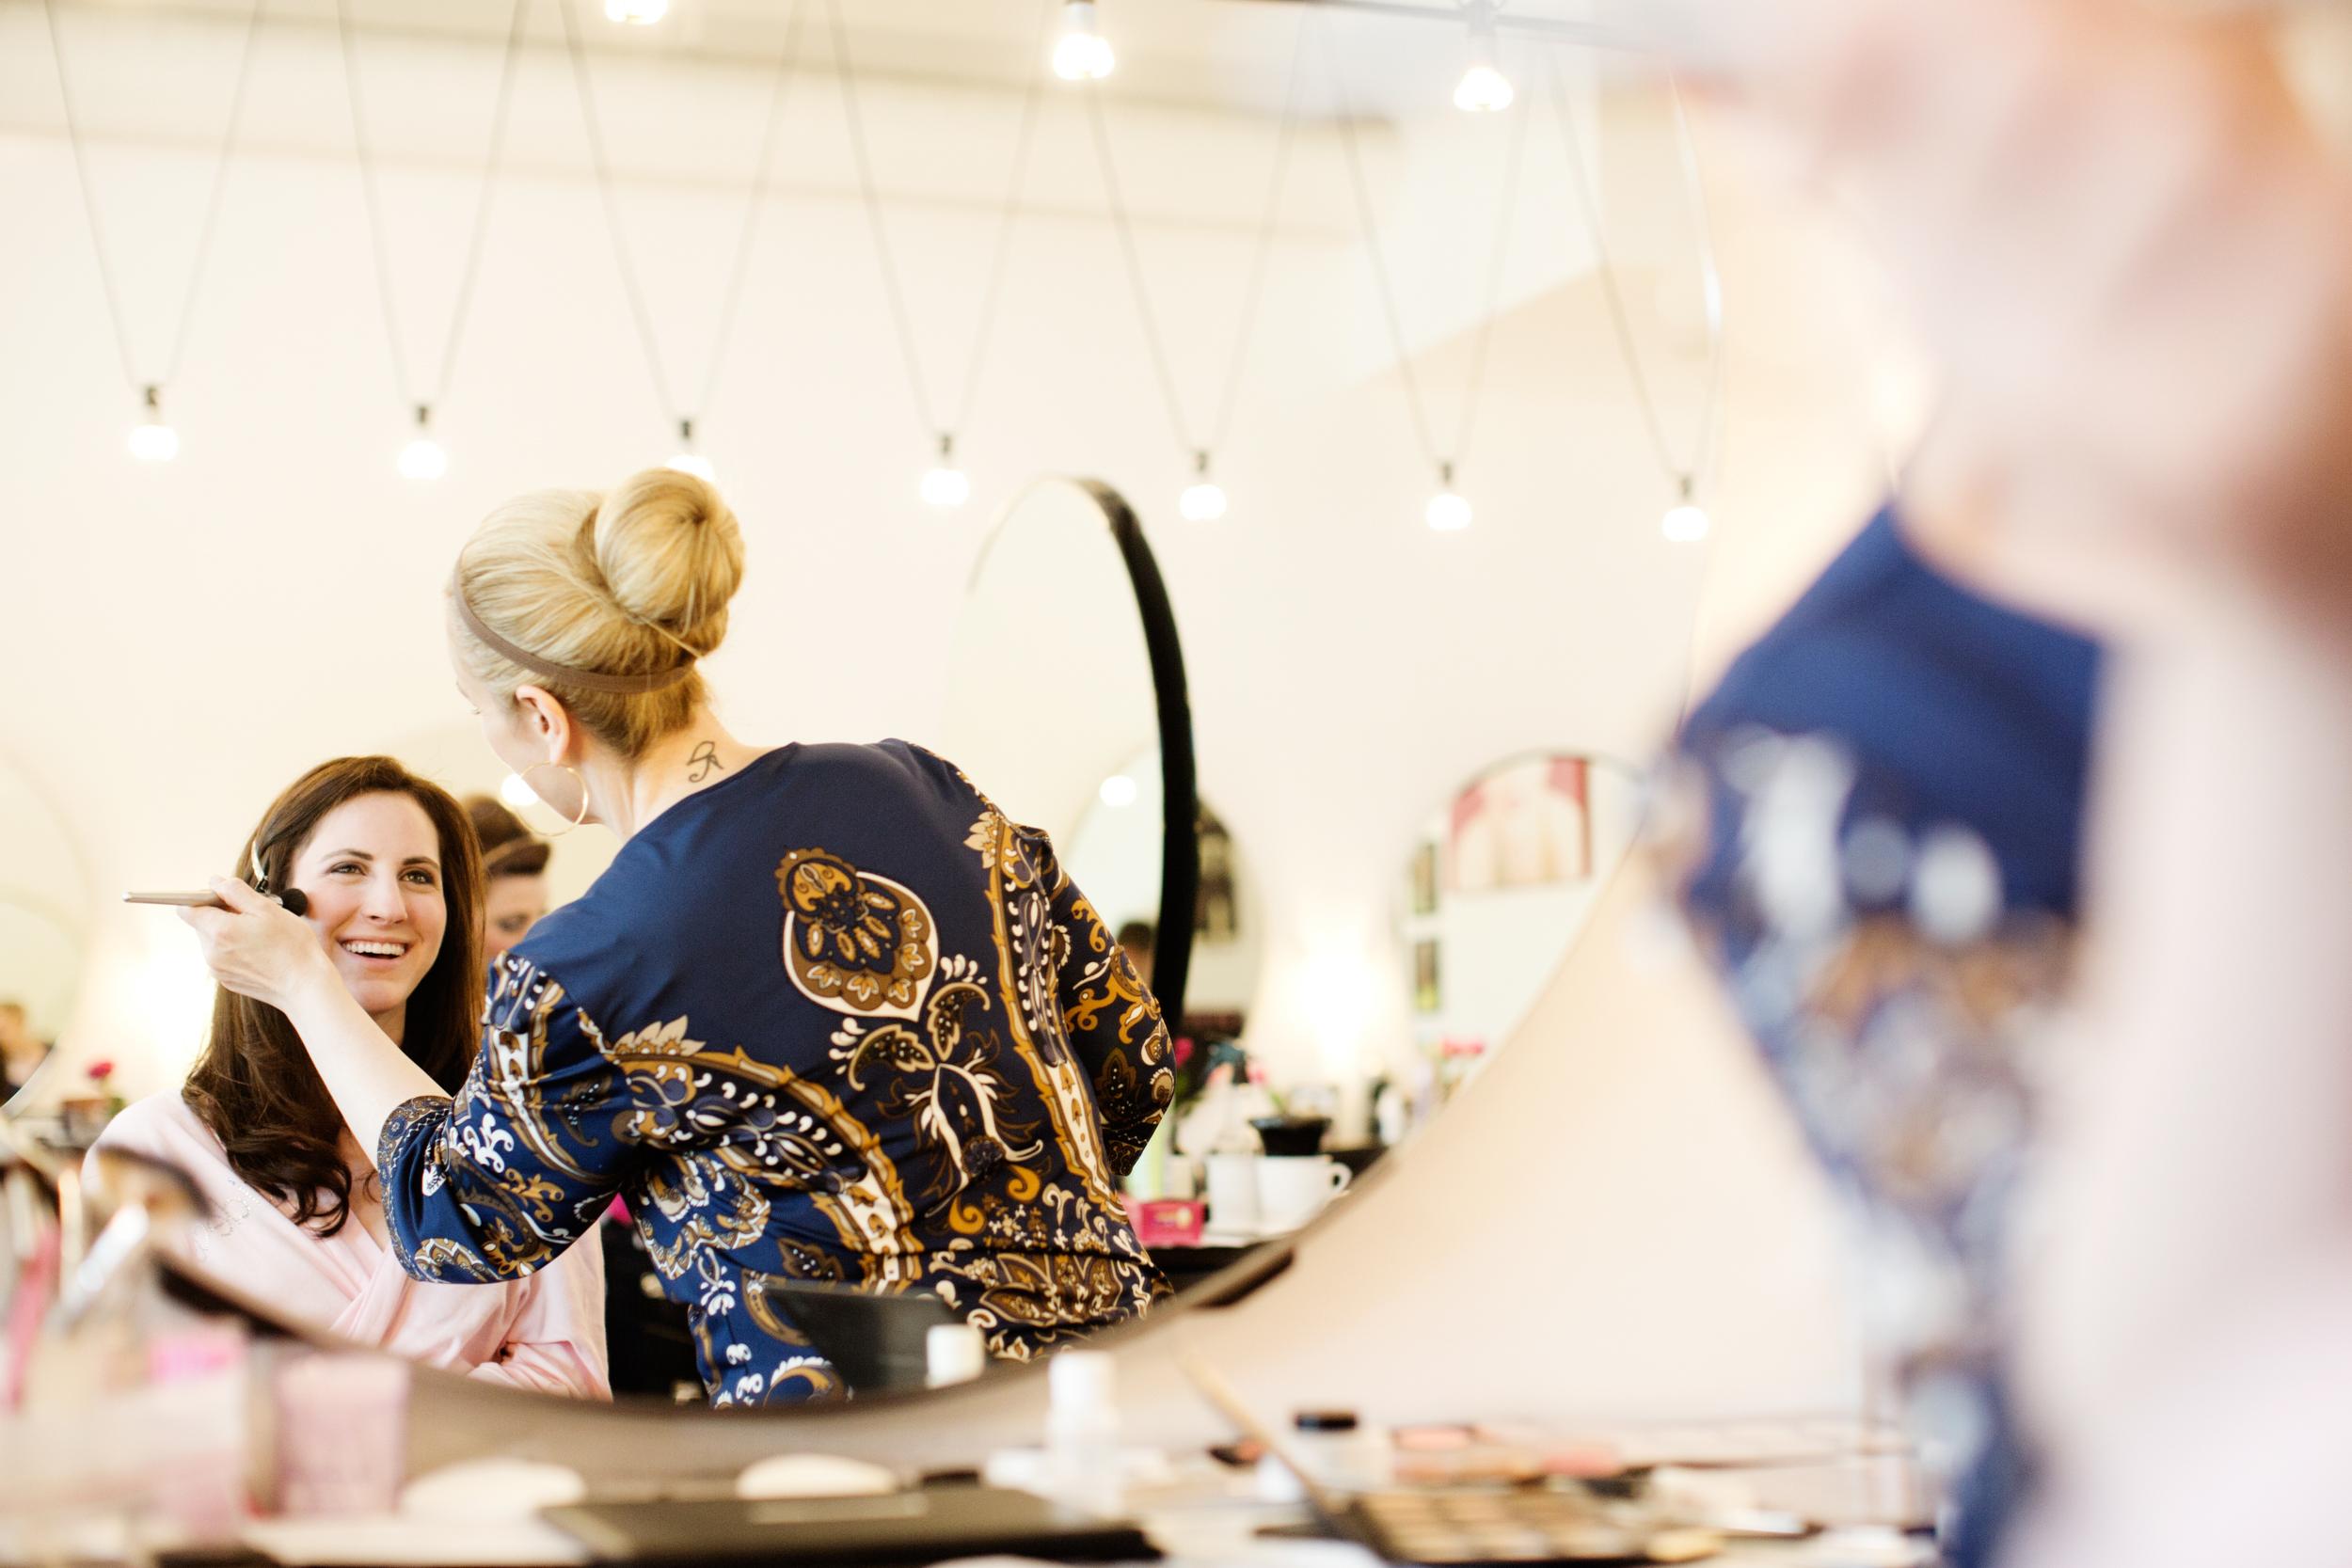 Ceci_New_York_Ceci_Style_Ceci_Johnson_Luxury_Lifestyle_Floral_Lace_Wedding_Letterpress_Inspiration_Design_Custom_Couture_Personalized_Invitations_-96.jpg